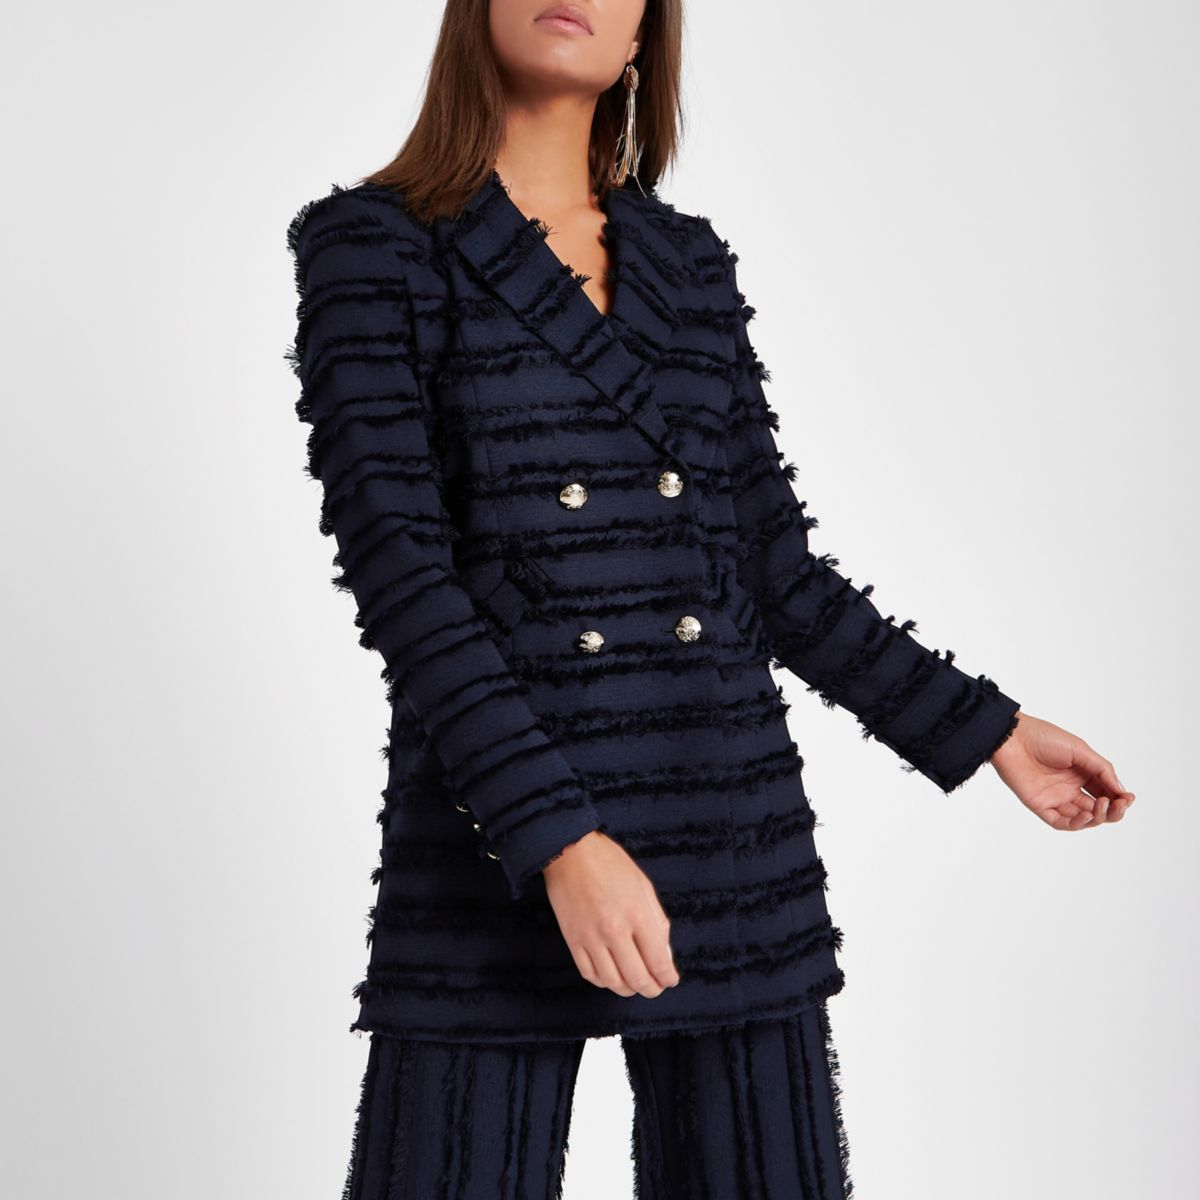 Navy fringed double breasted jacket